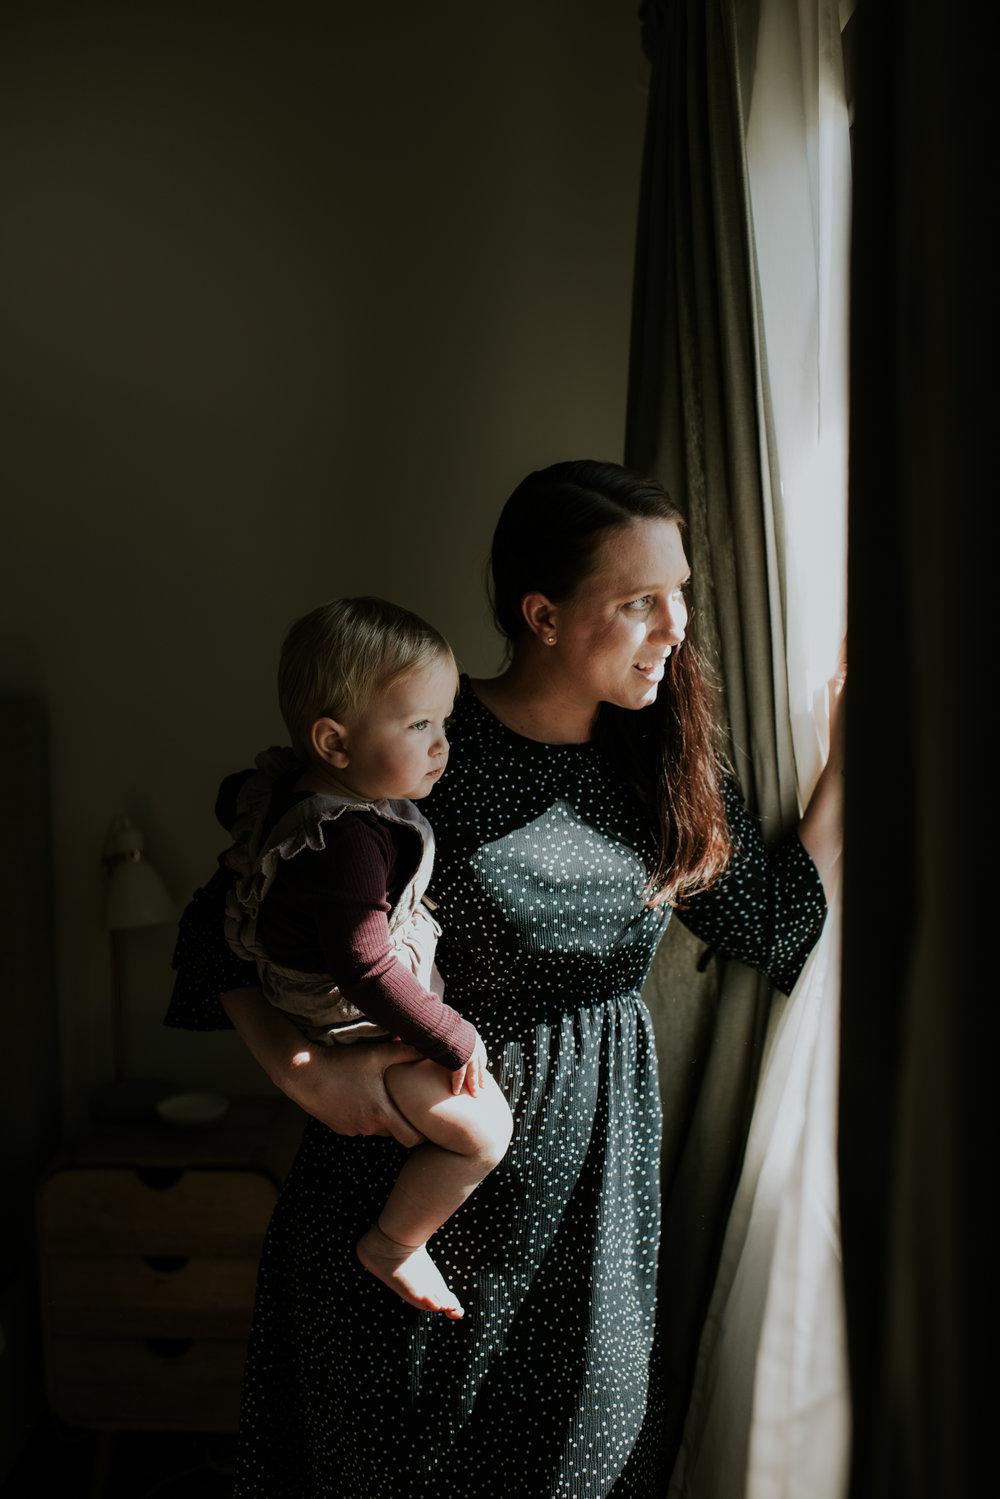 Brisbane Family Photographer   Newborn-Lifestyle Photography-12.jpg